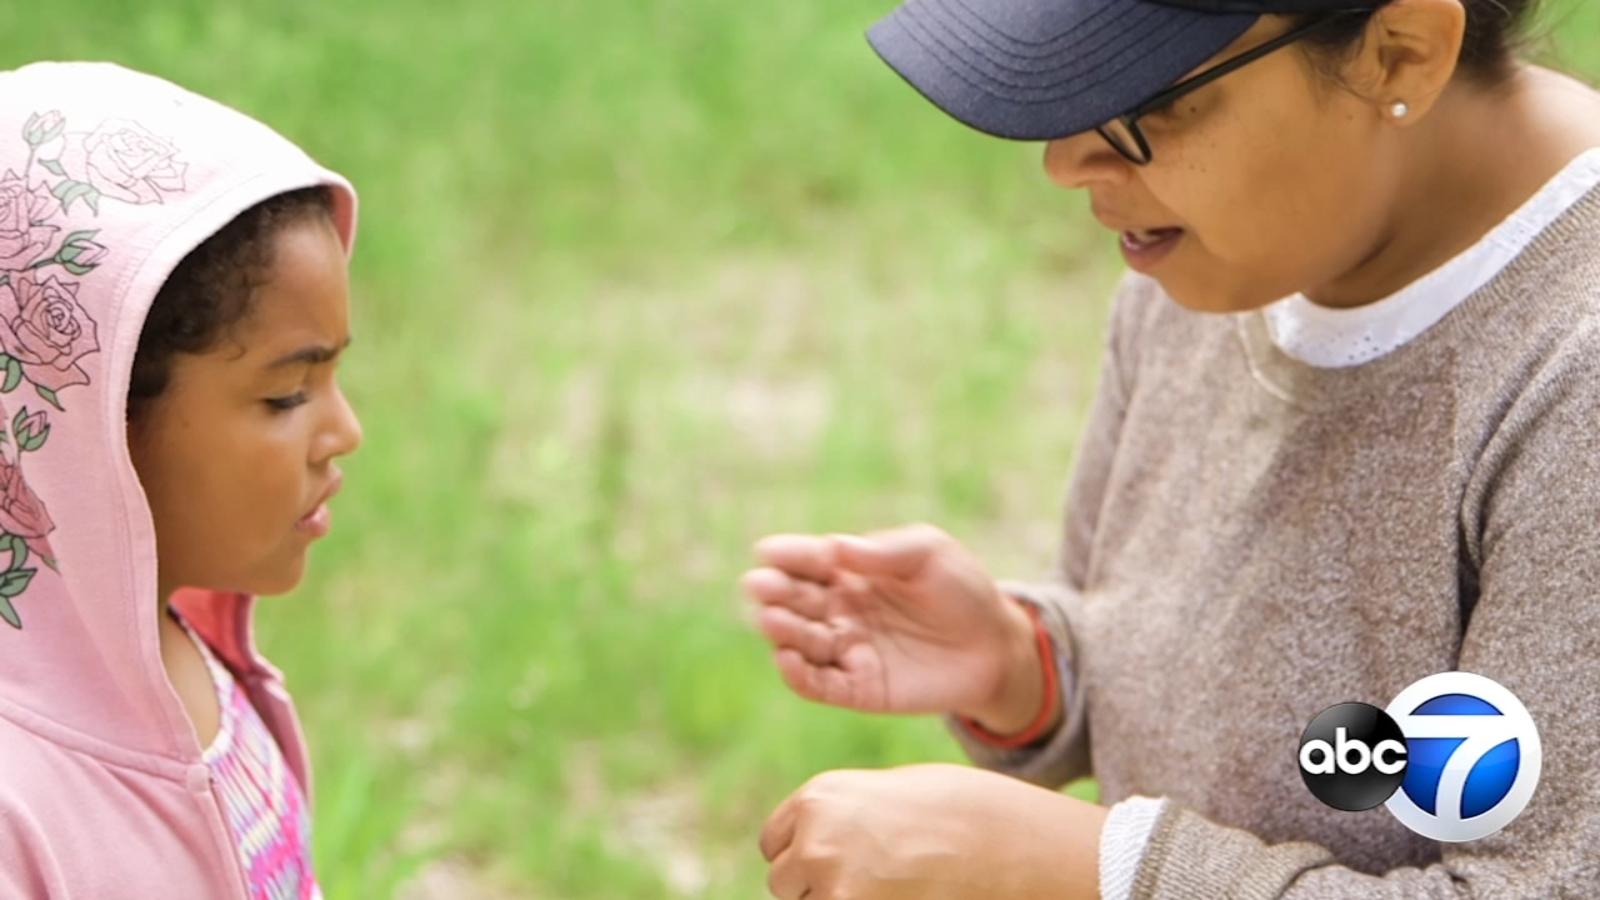 Audubon Society restores Calumet Big Marsh, brings minority communities into nature